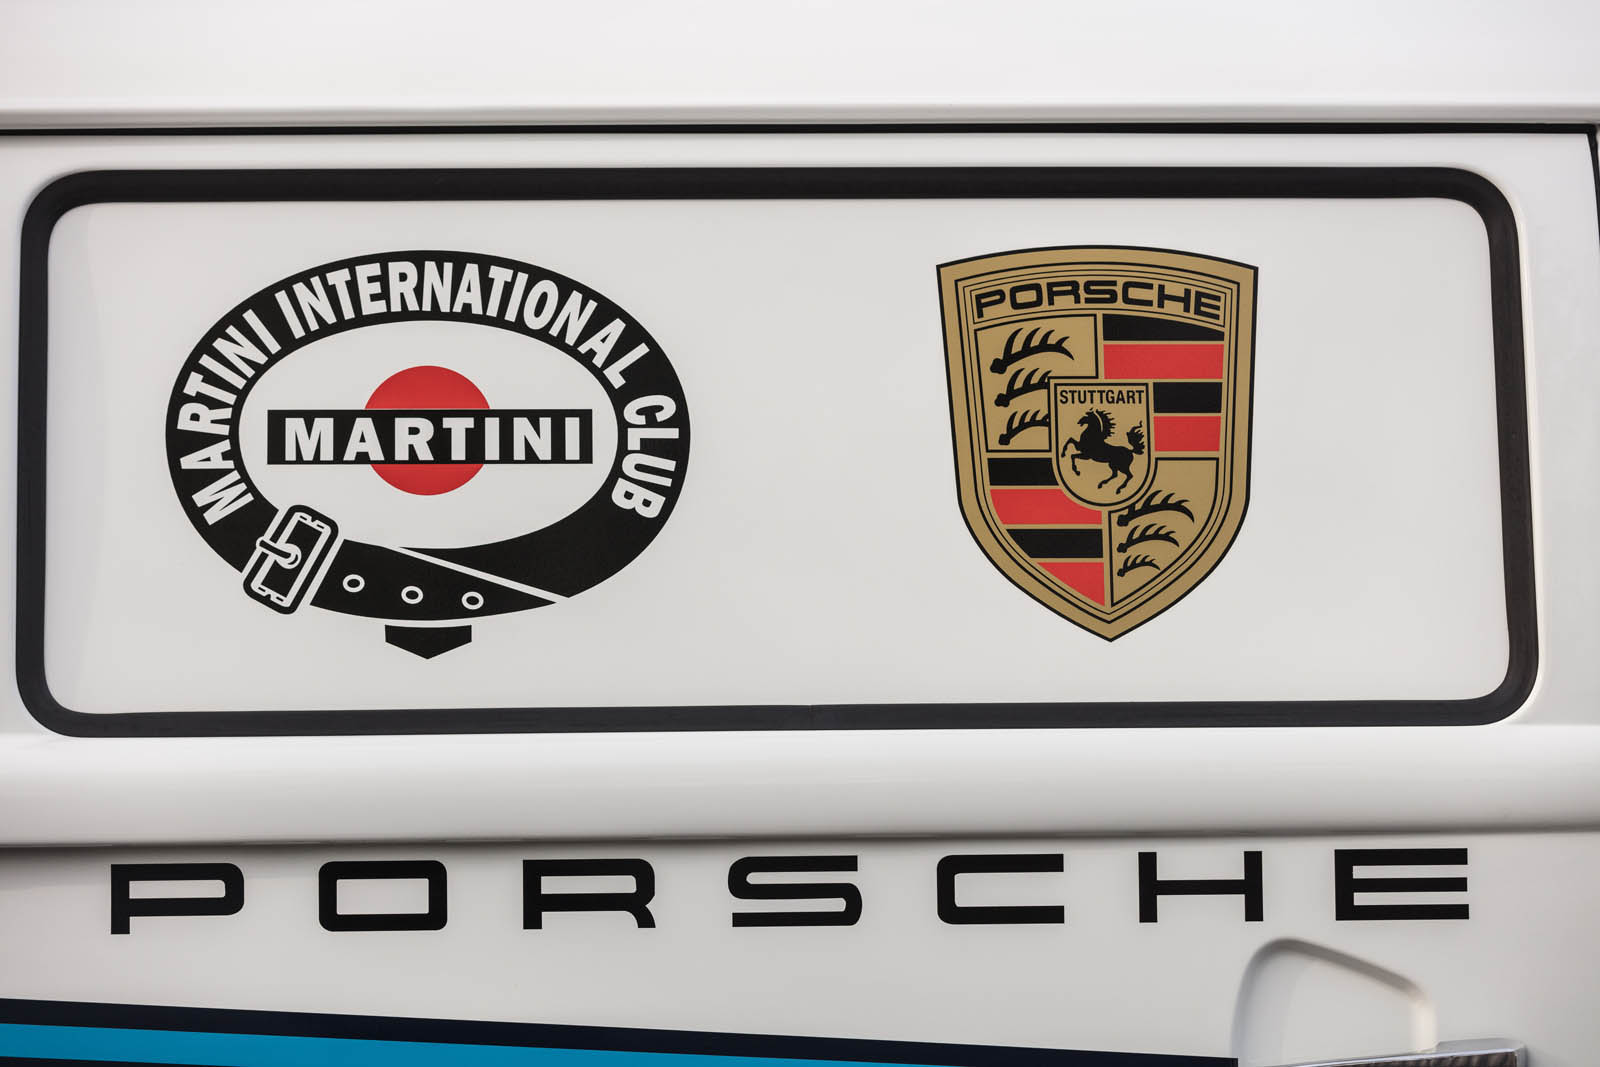 martini-porsche935-vwbus-0050-4%2Bcopy.jpg